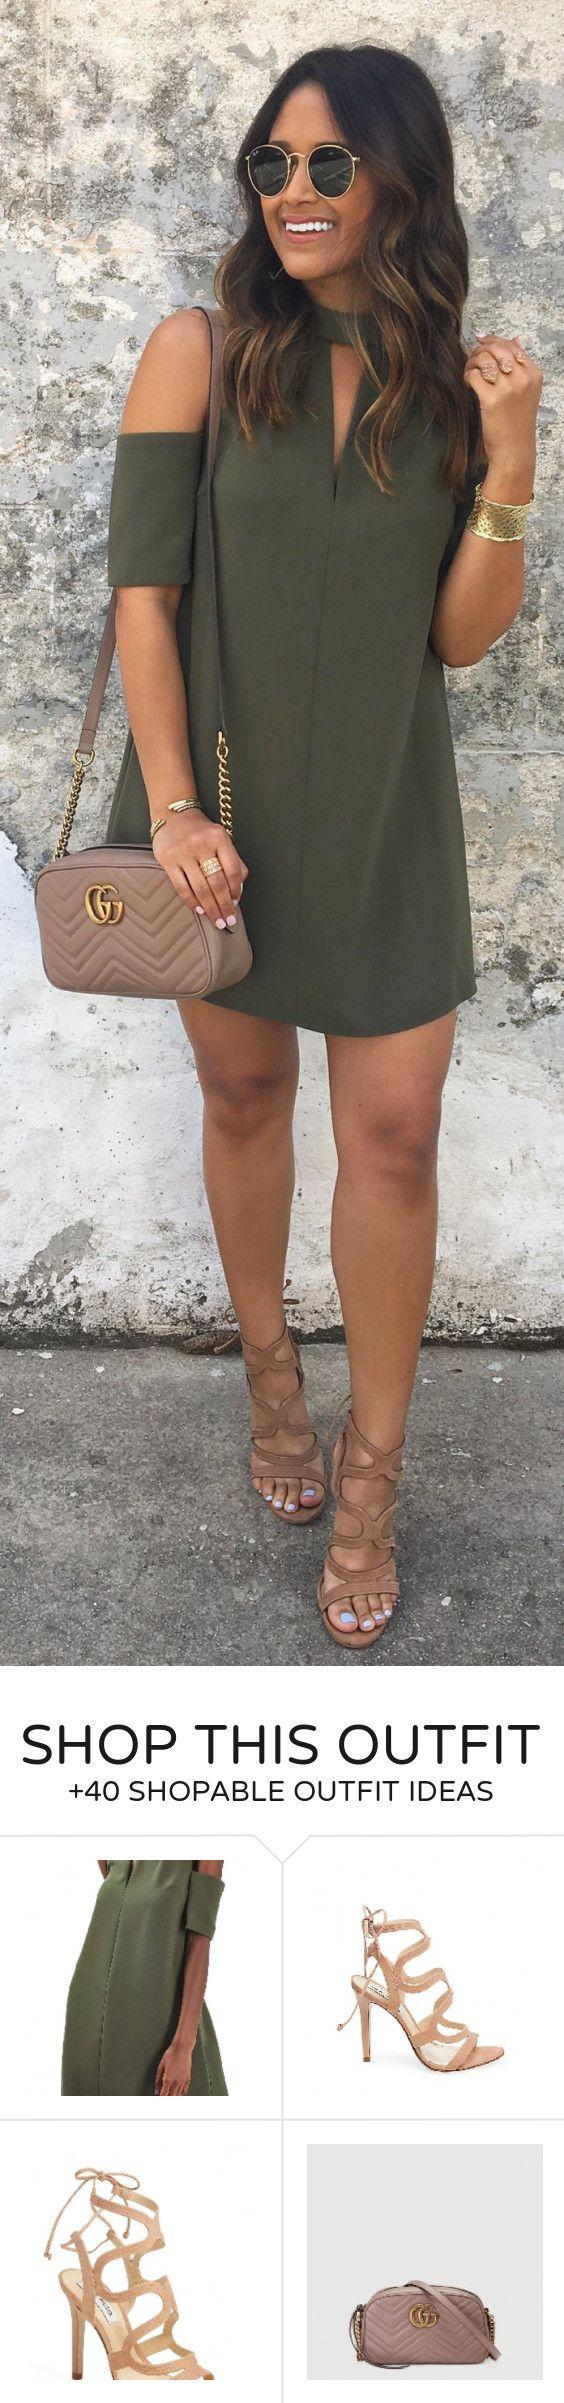 #spring #outfits / Green Open Shoulder Dress / Коричневая кожаная сумка / Коричневые сандалии